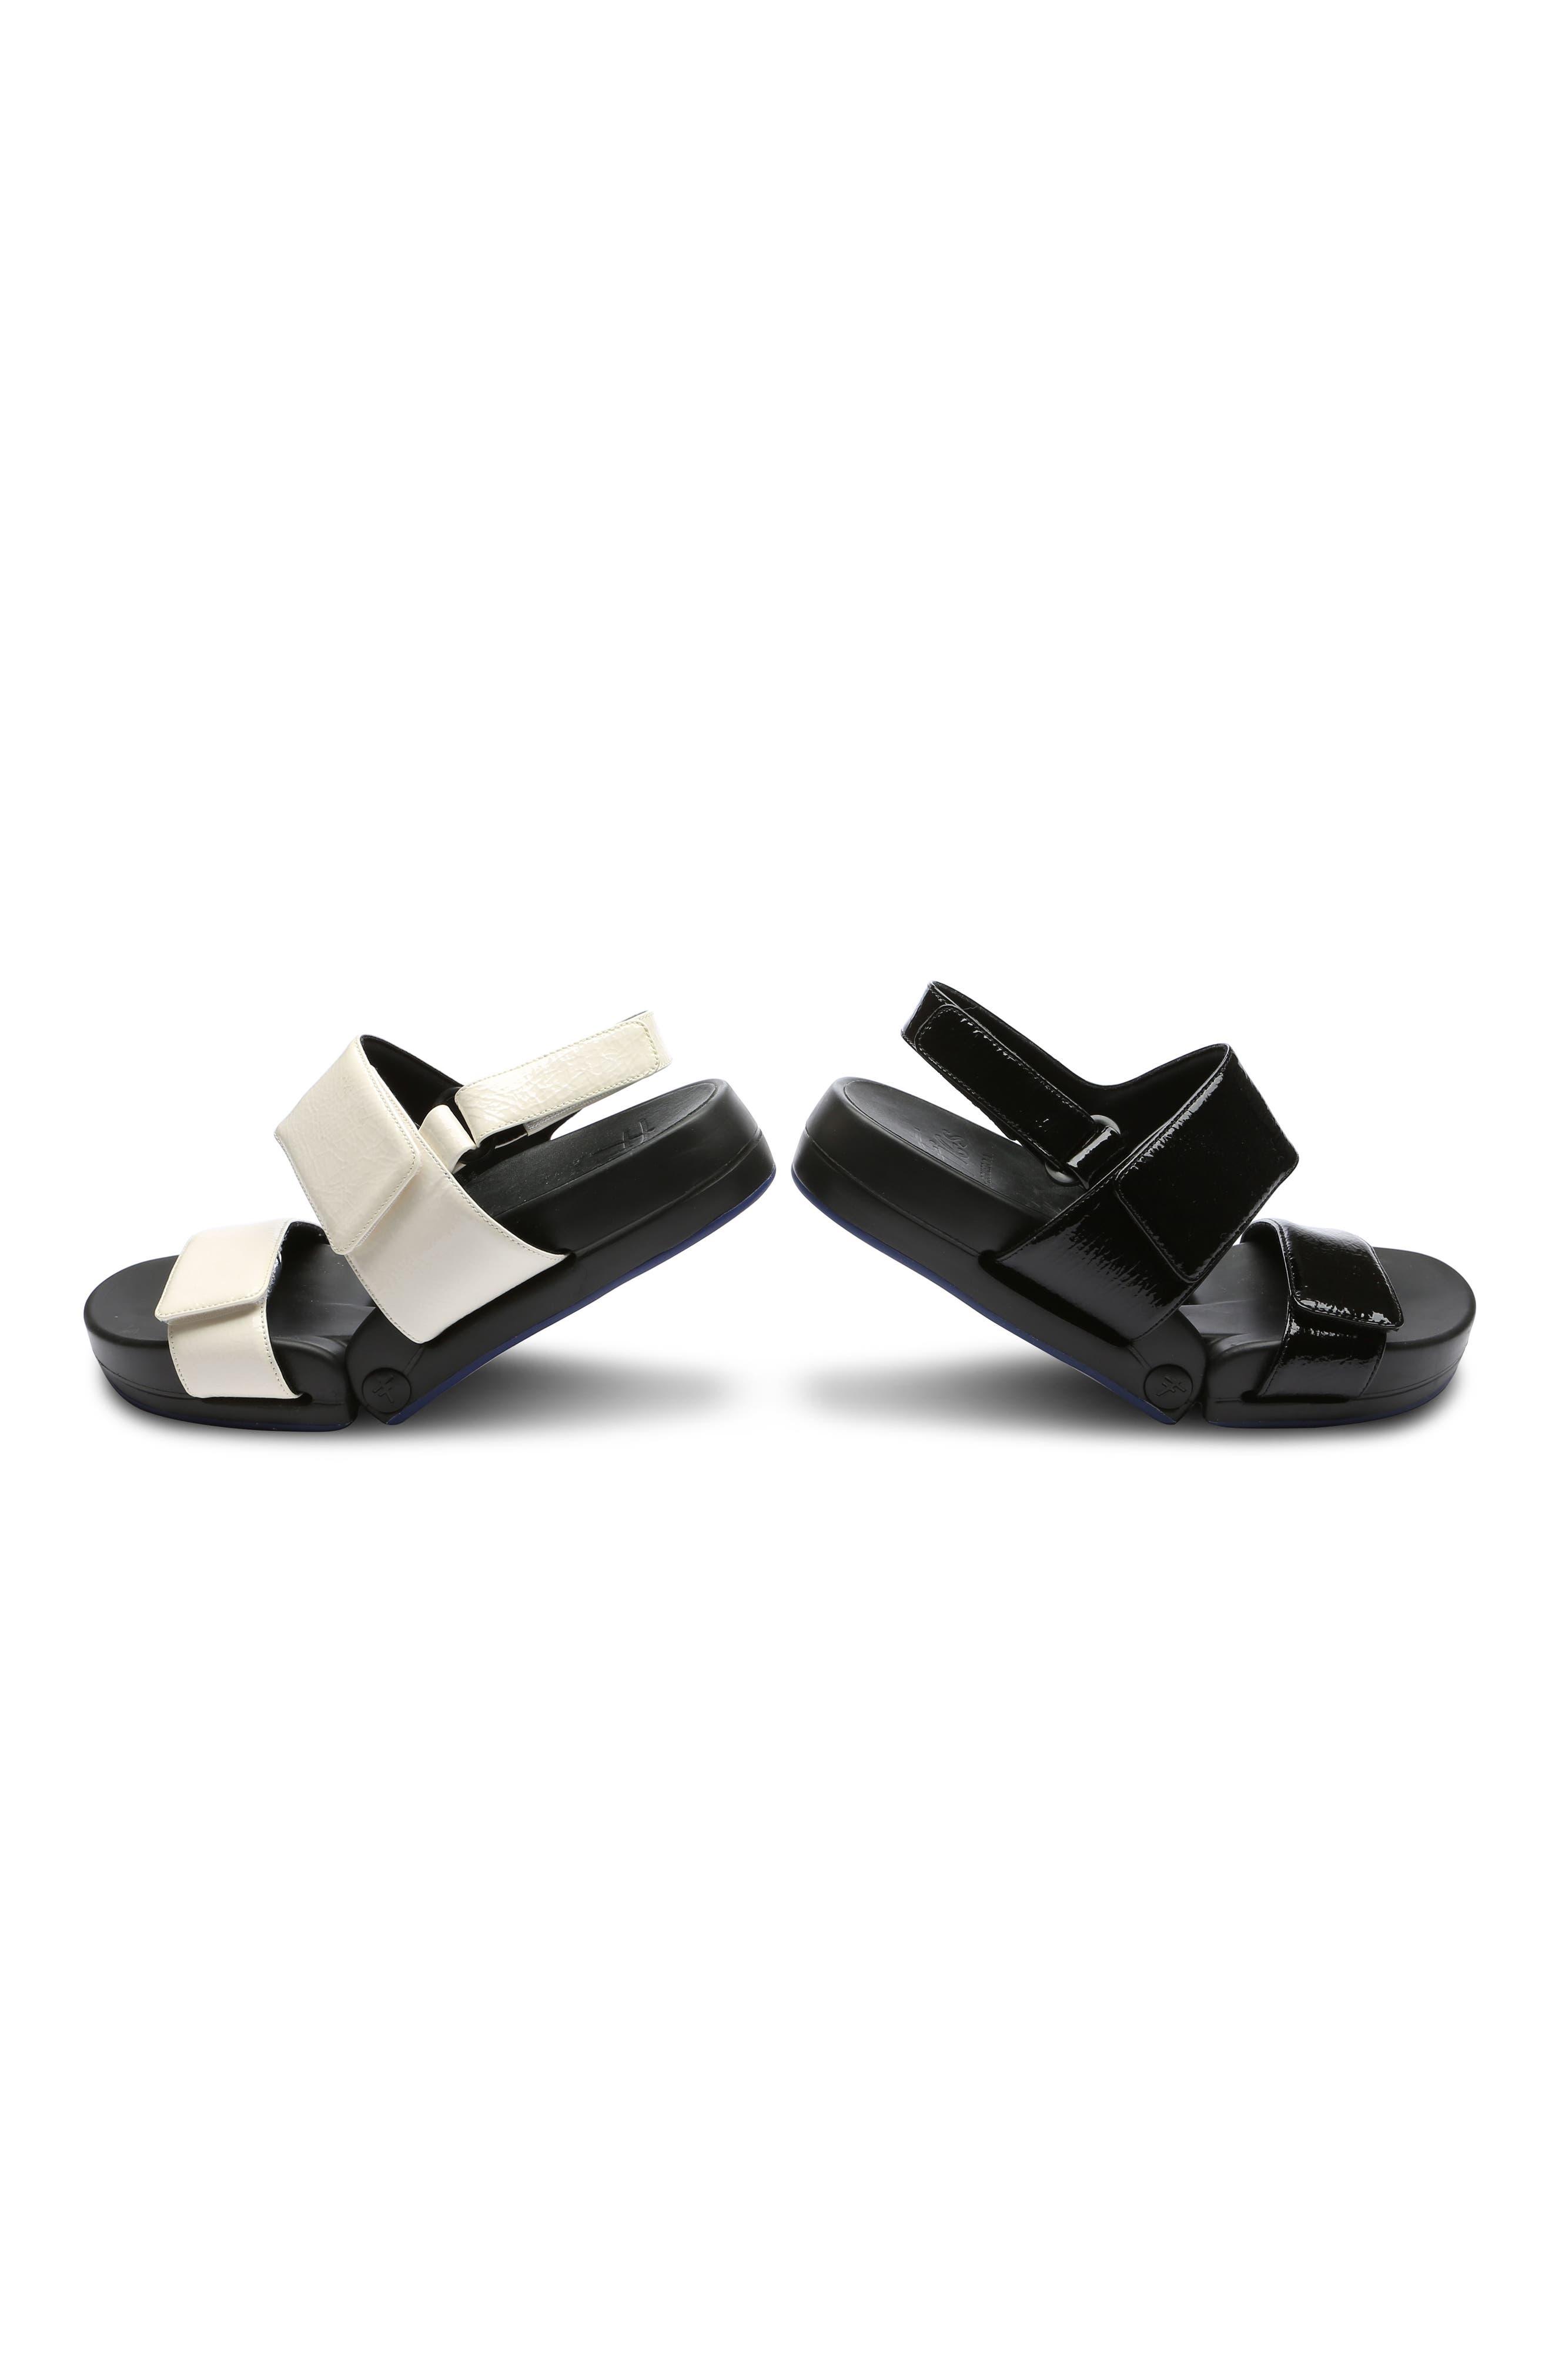 Figulous Sandal,                             Alternate thumbnail 8, color,                             BLACK CRINKLE PATENT LEATHER